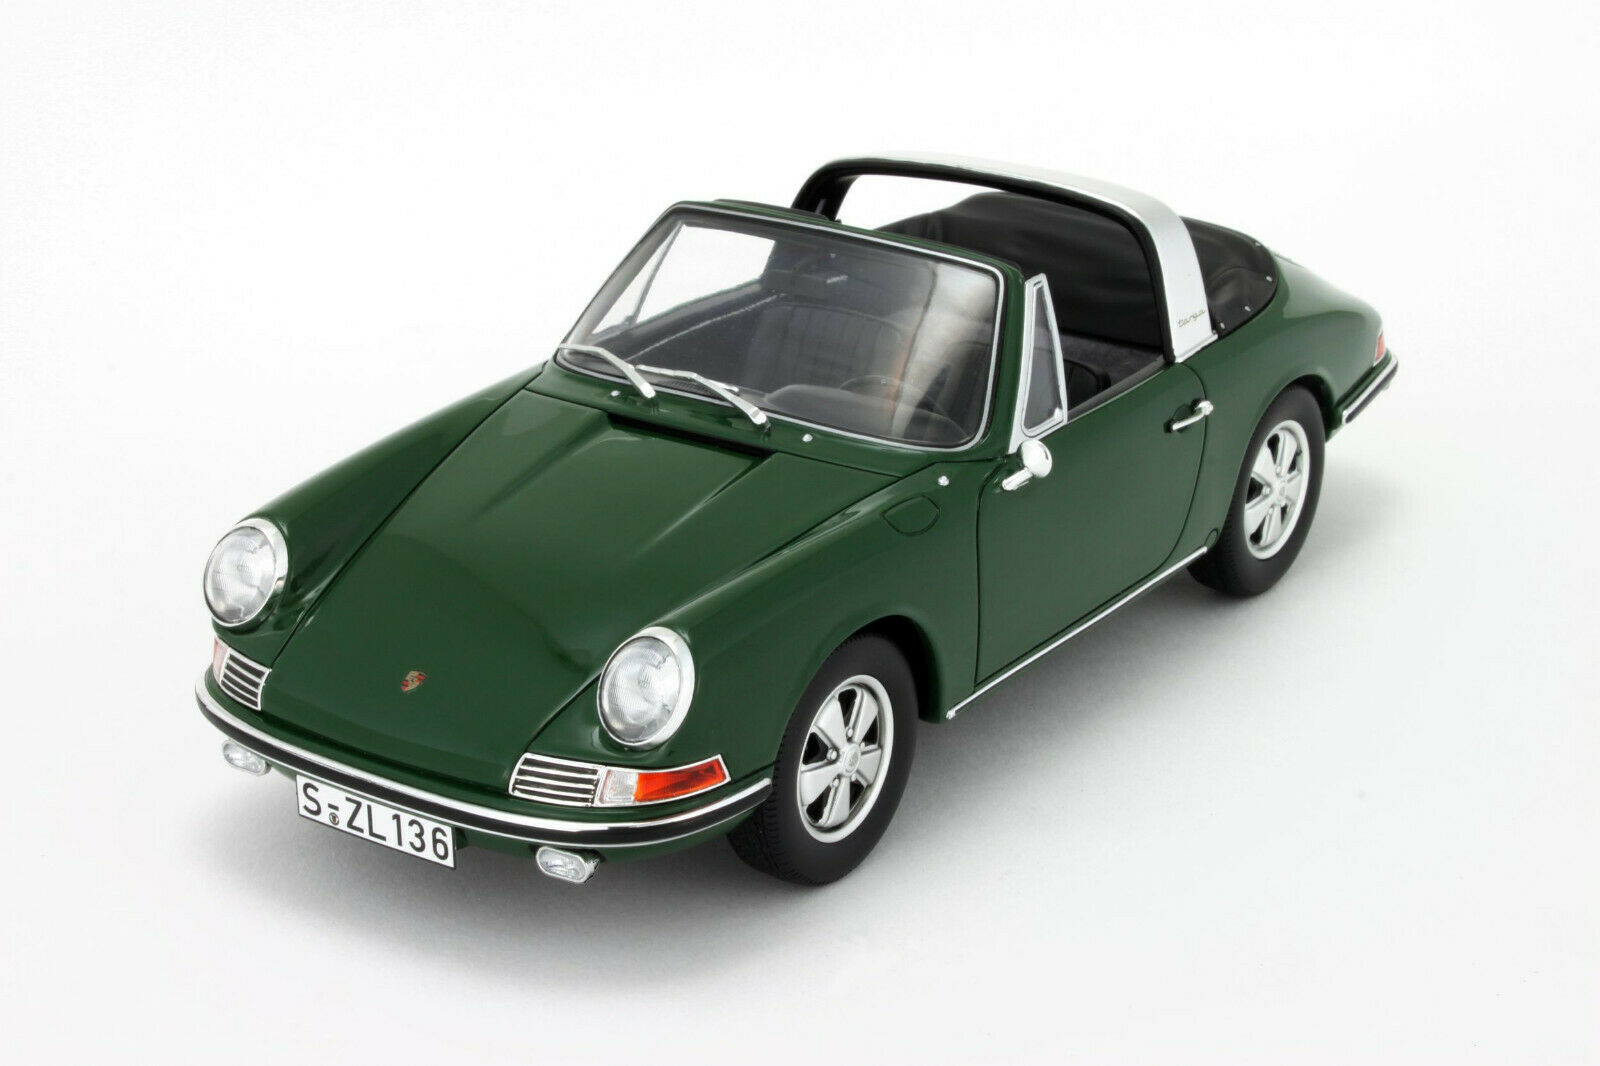 PORSCHE 911 901 2L TARGA 1967 verde GTSPIRIT GT001CS 1 18 RESINE GRUN verde verde